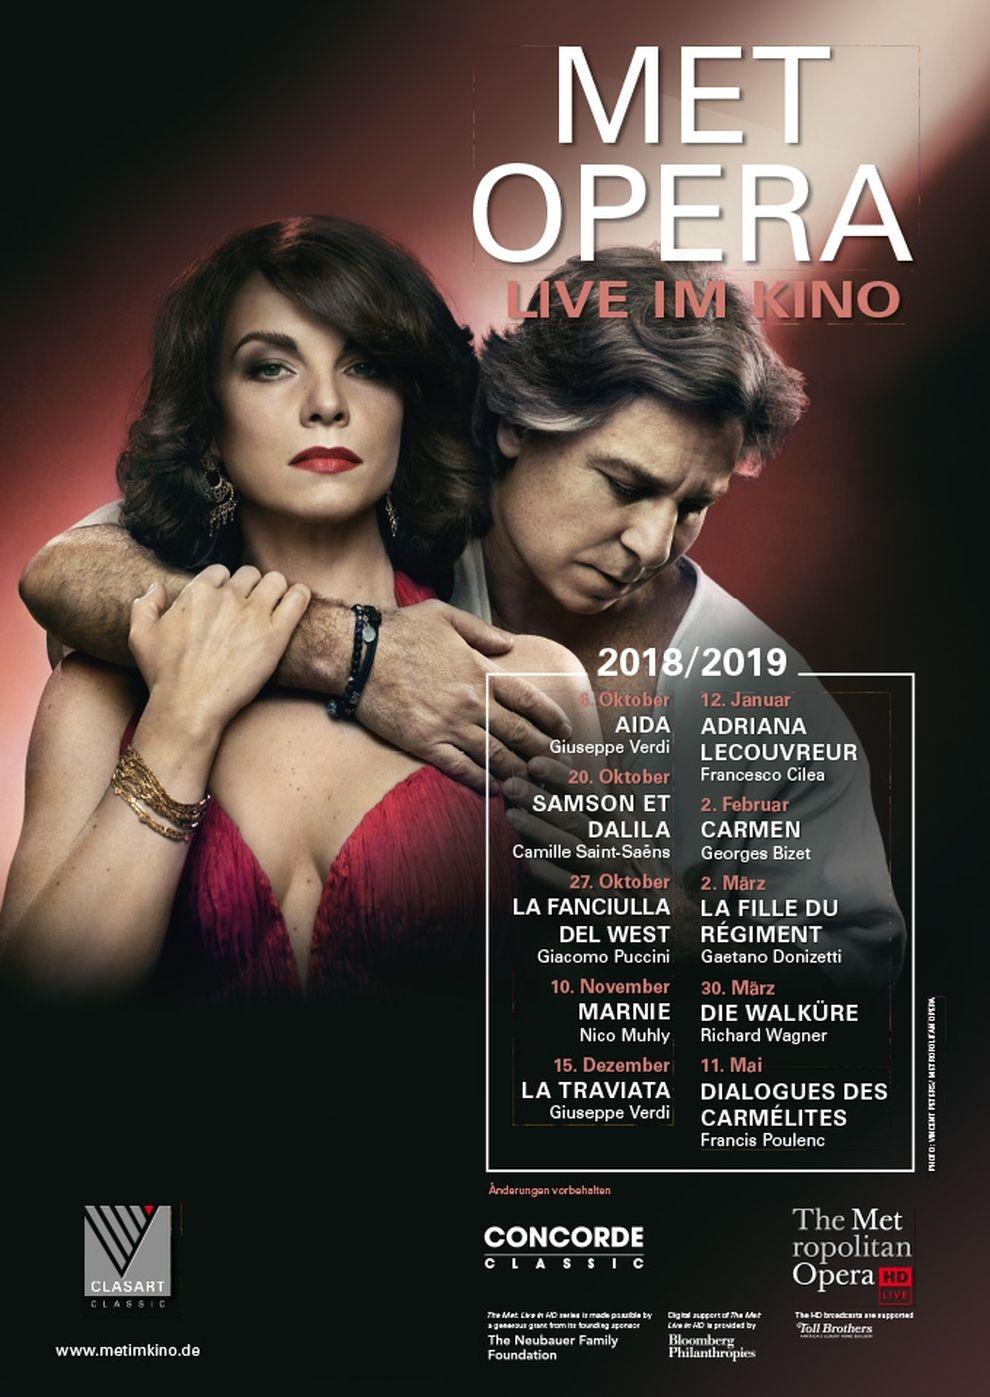 Met Opera 2018/19: Marnie (Muhly) (Poster)